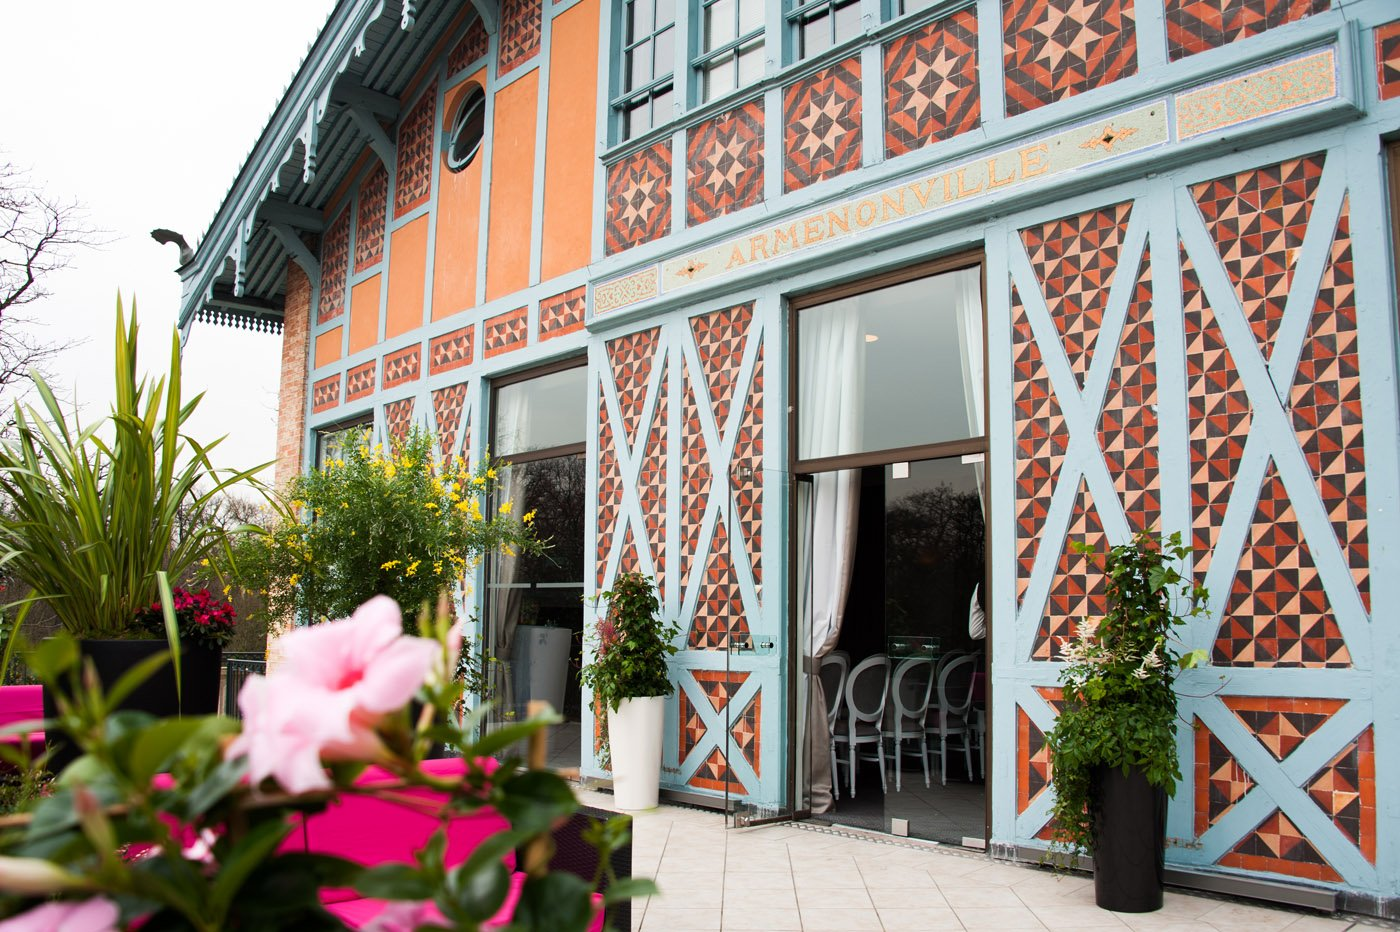 Pavillon d'Armenonville, Butard Enescot